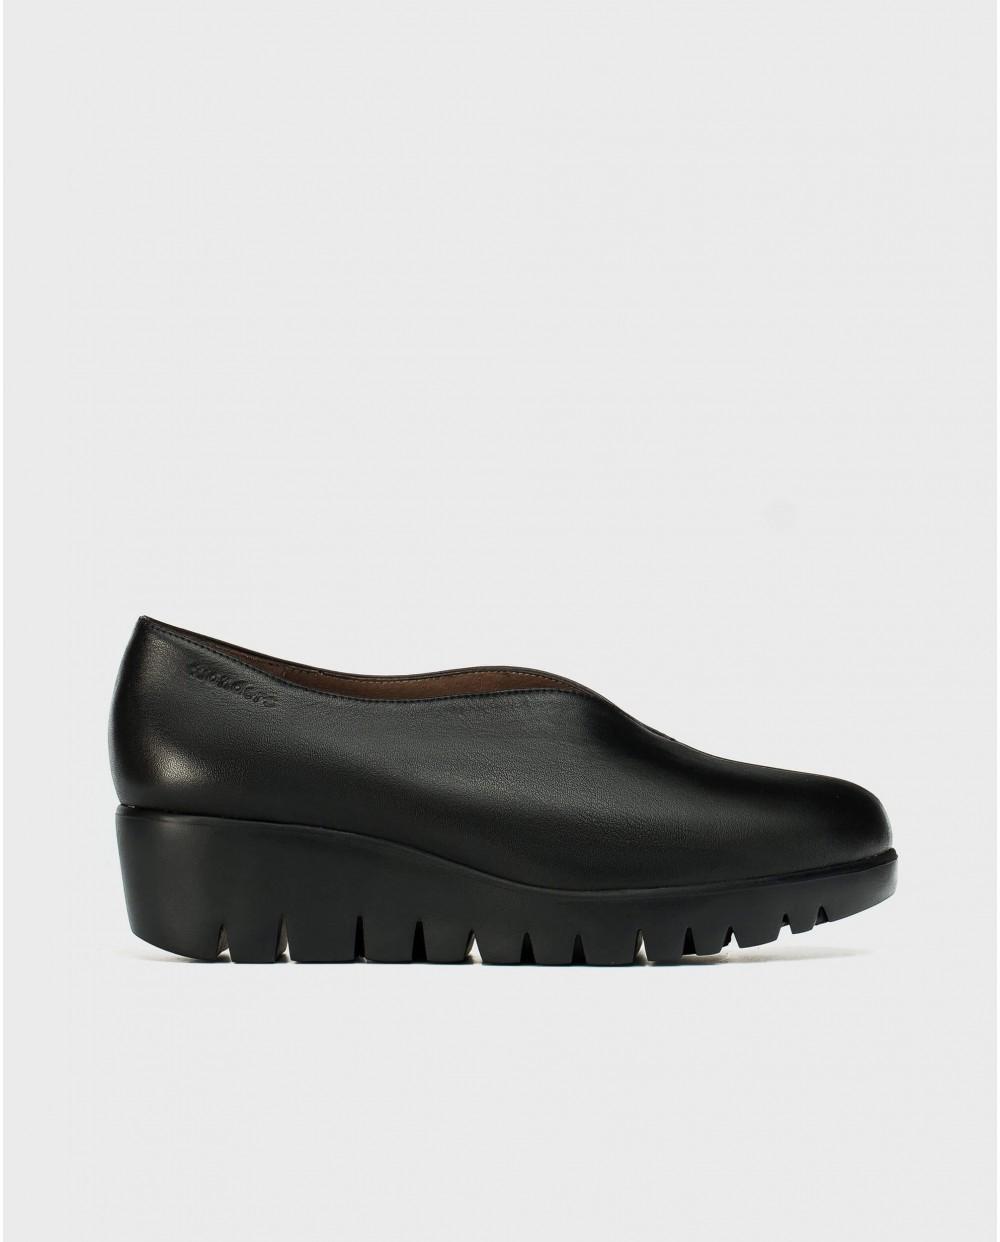 Wonders-Plataformas-Zapato de piel negro